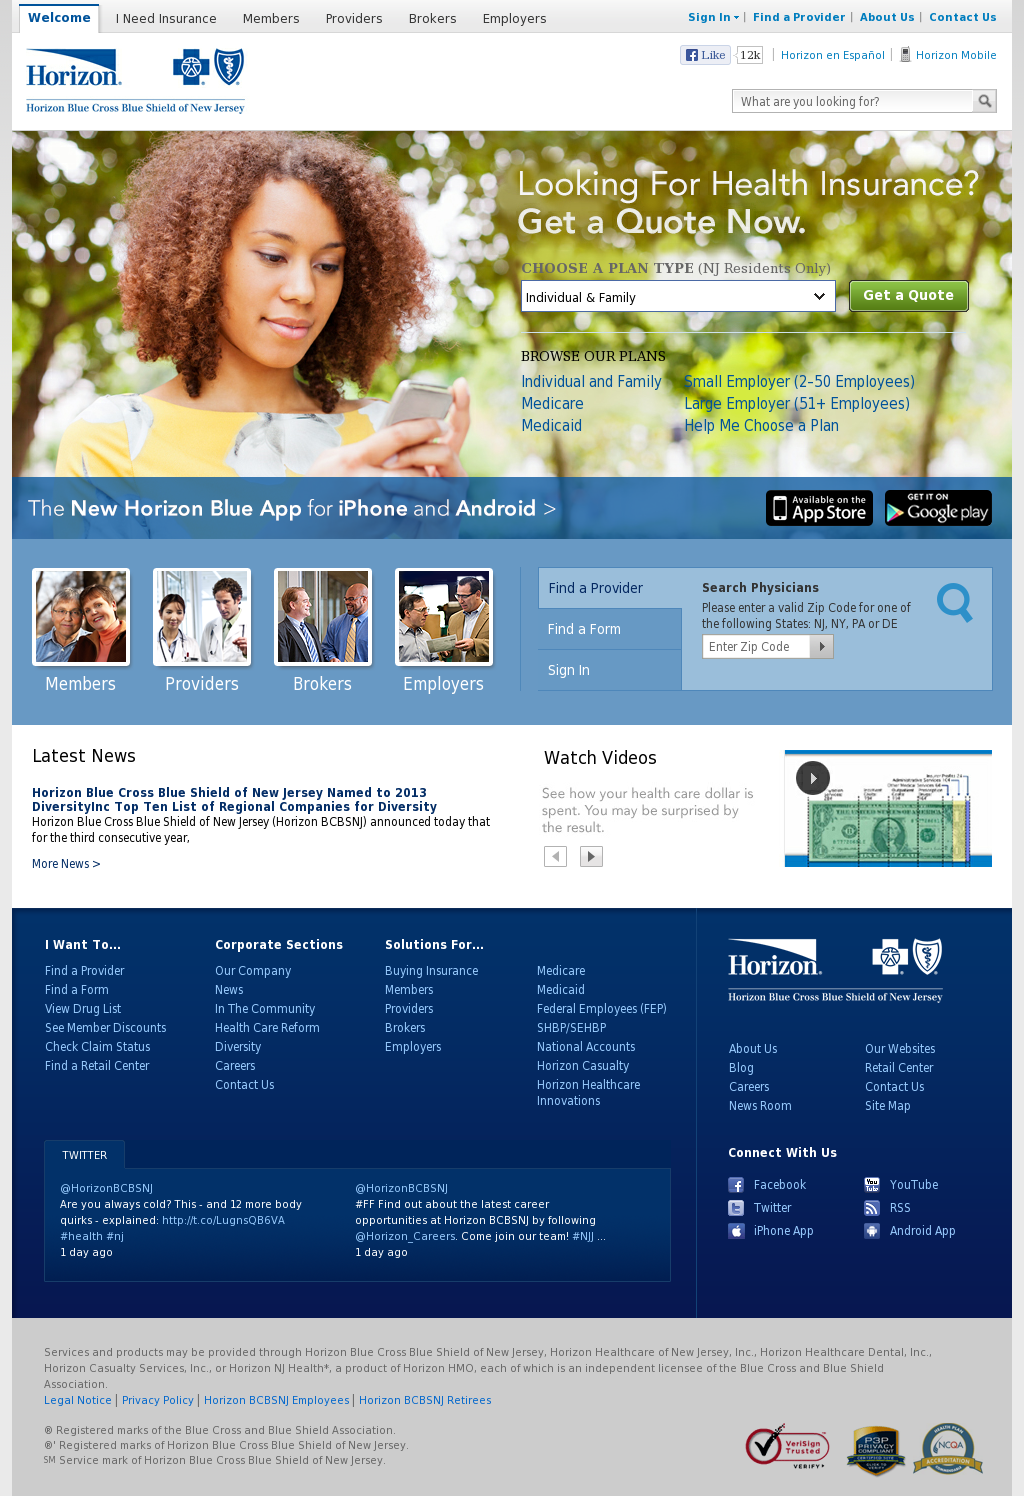 Horizon BCBSNJ Competitors, Revenue and Employees - Owler Company